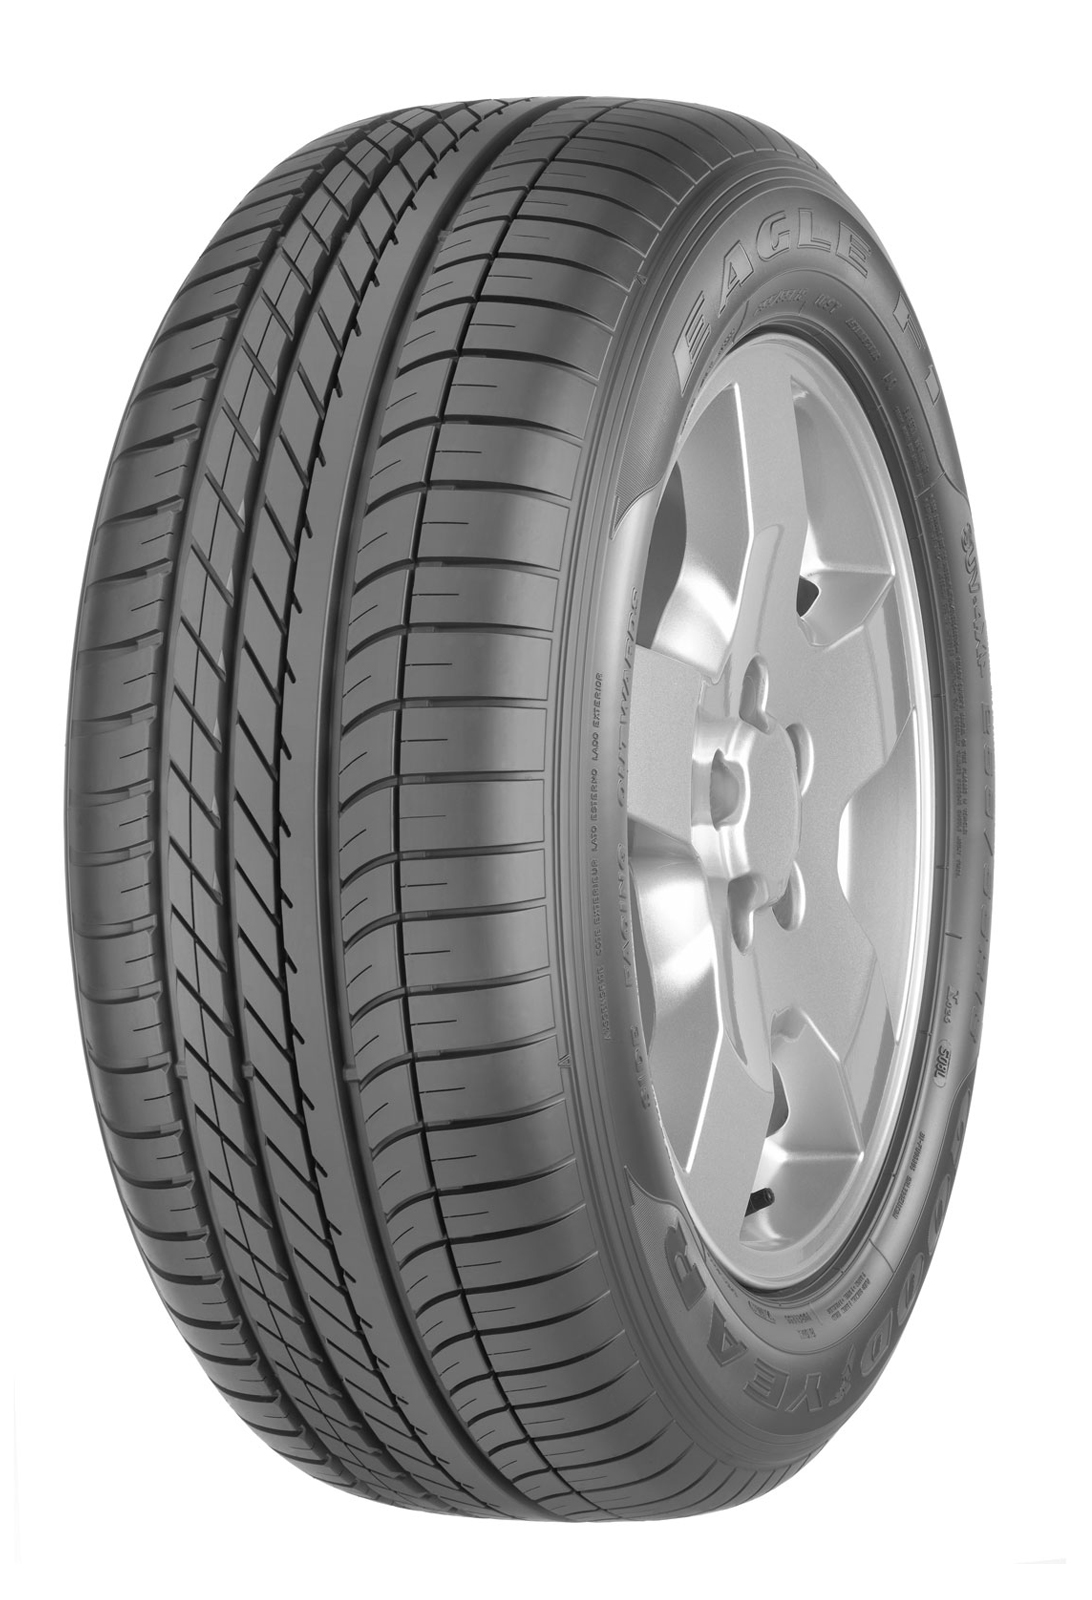 автомобильные шины Goodyear Eagle F1 Asymmetric SUV AT 255/55 R19 111W